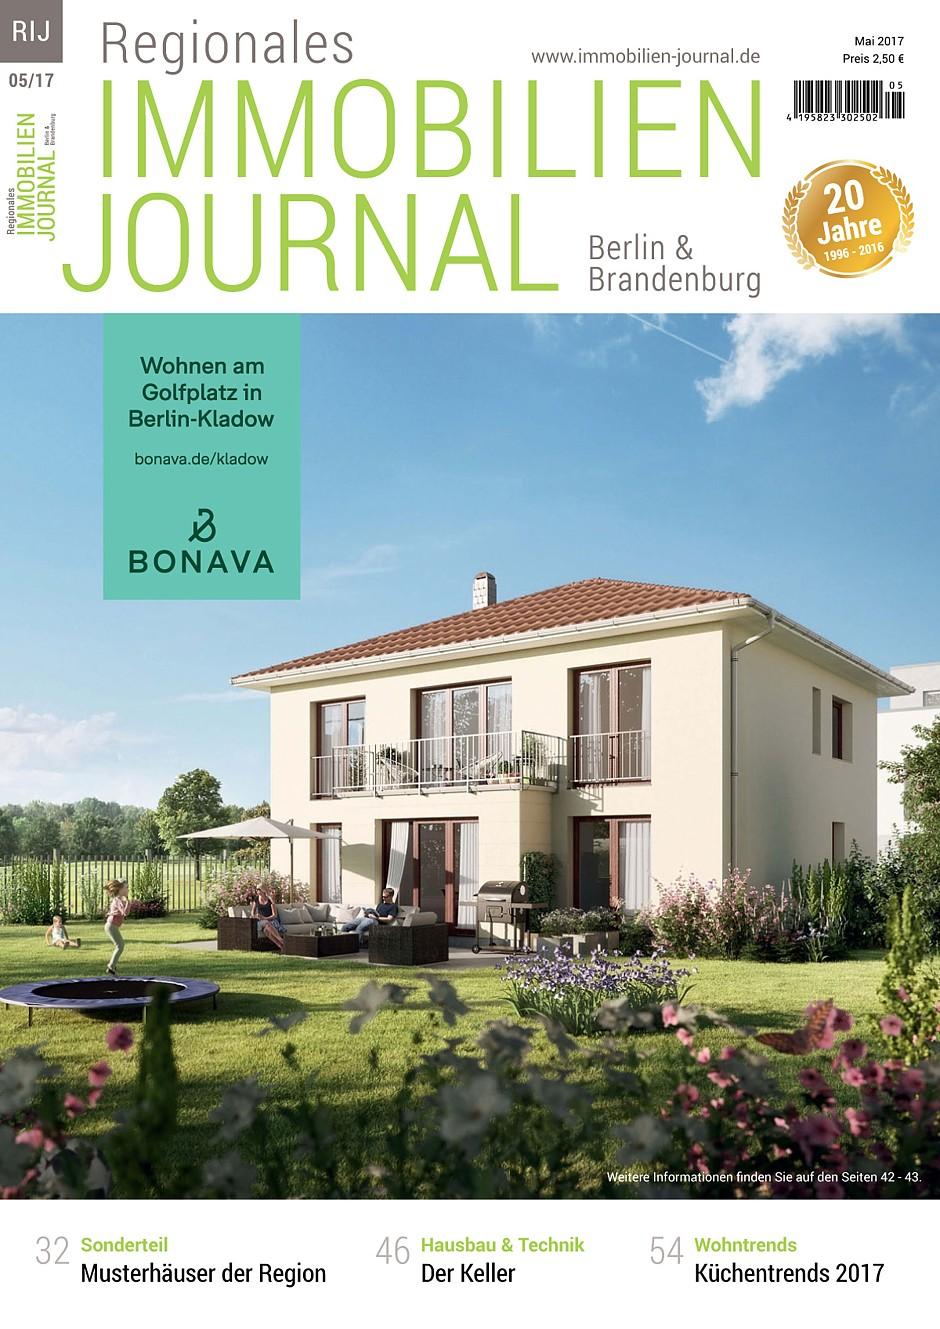 Regionales Immobilien Journal Berlin & Brandenburg Mai 2017